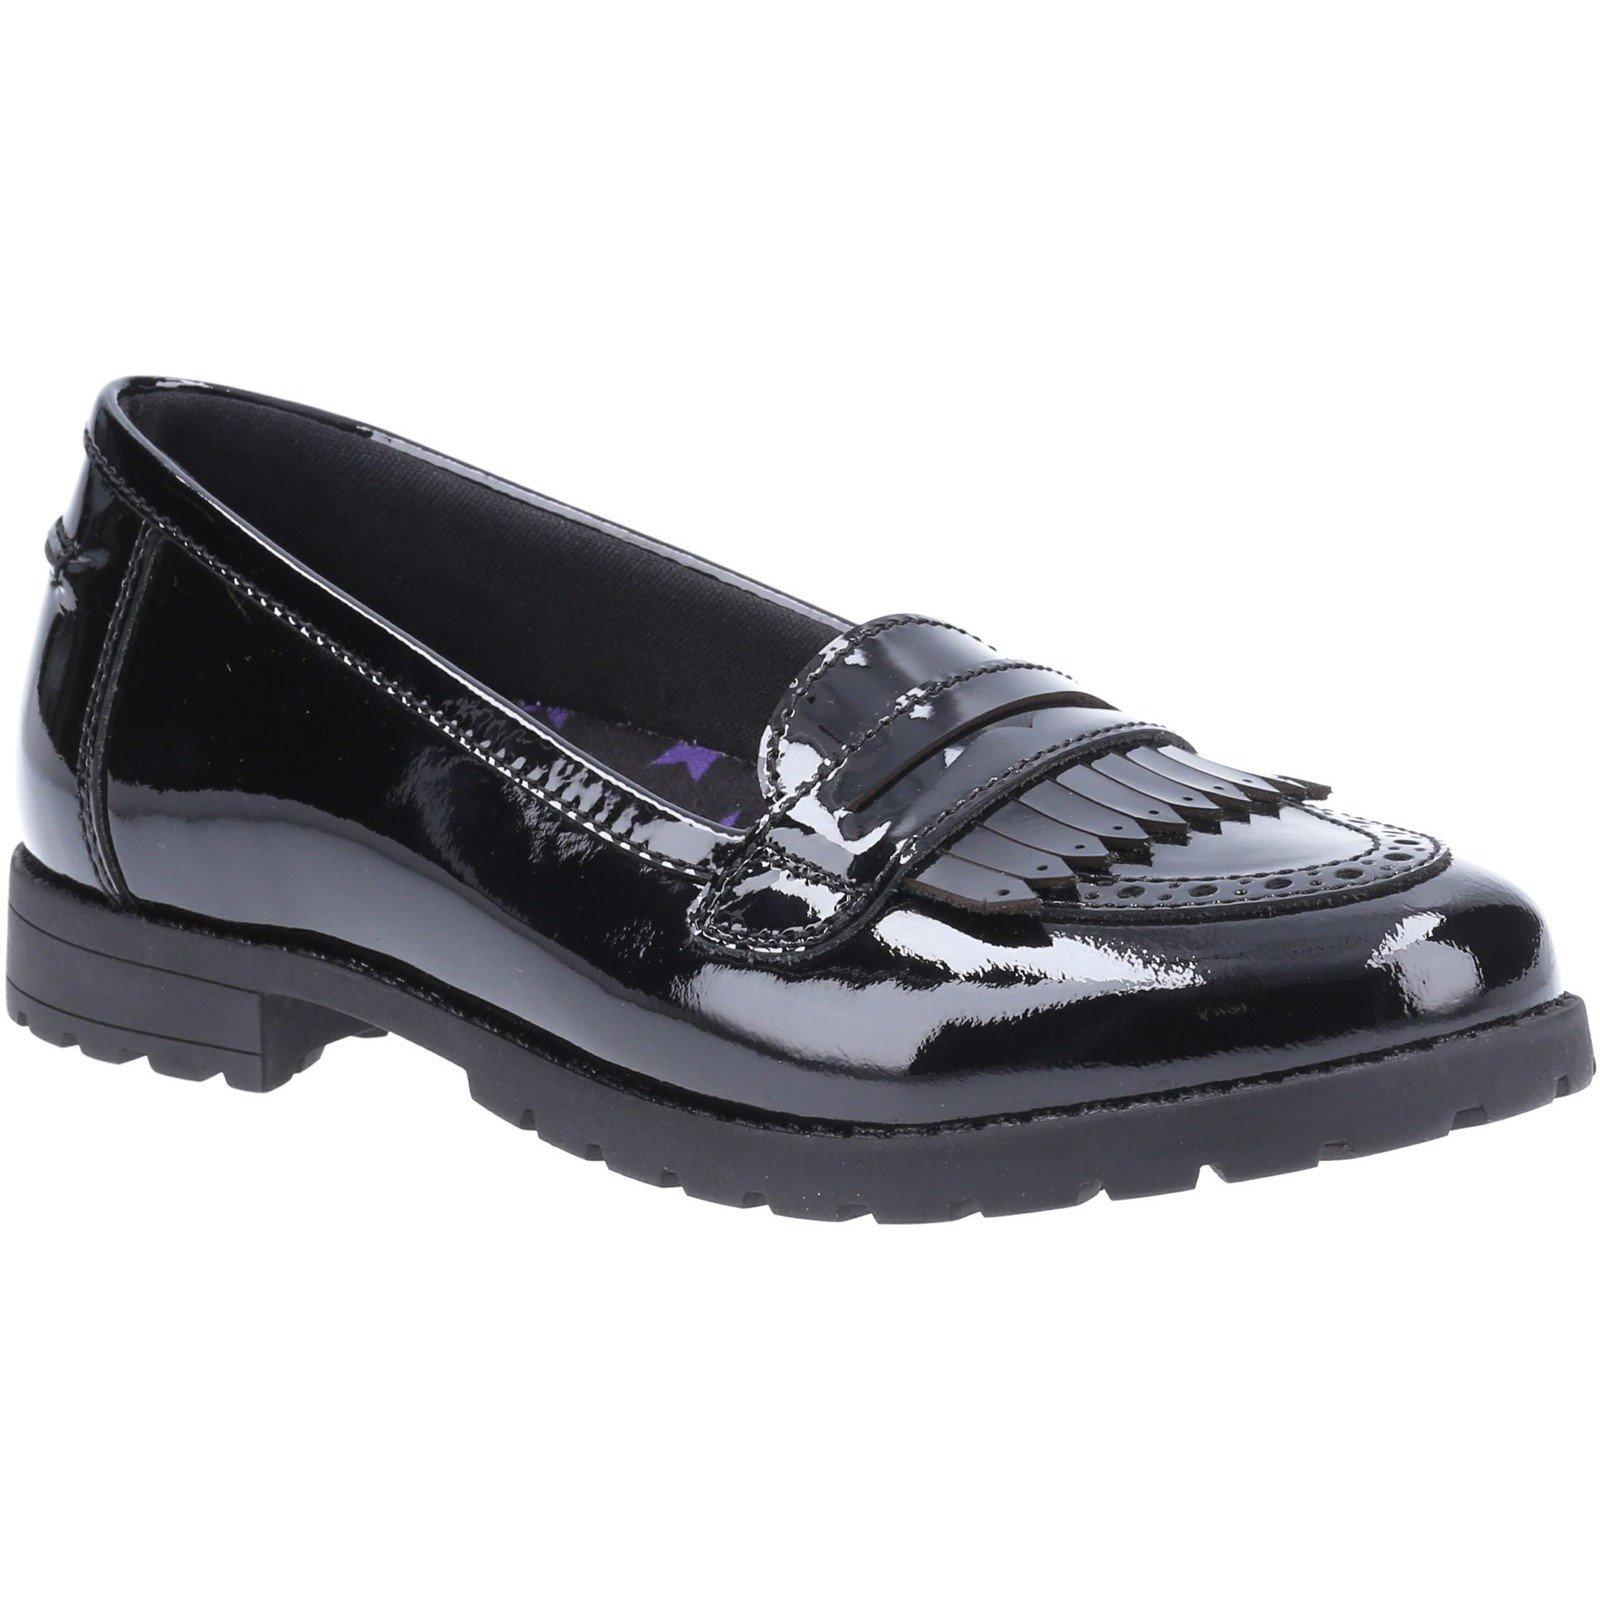 Hush Puppies Kid's Emer Senior School Shoe Patent Black 32596 - Patent Black 5